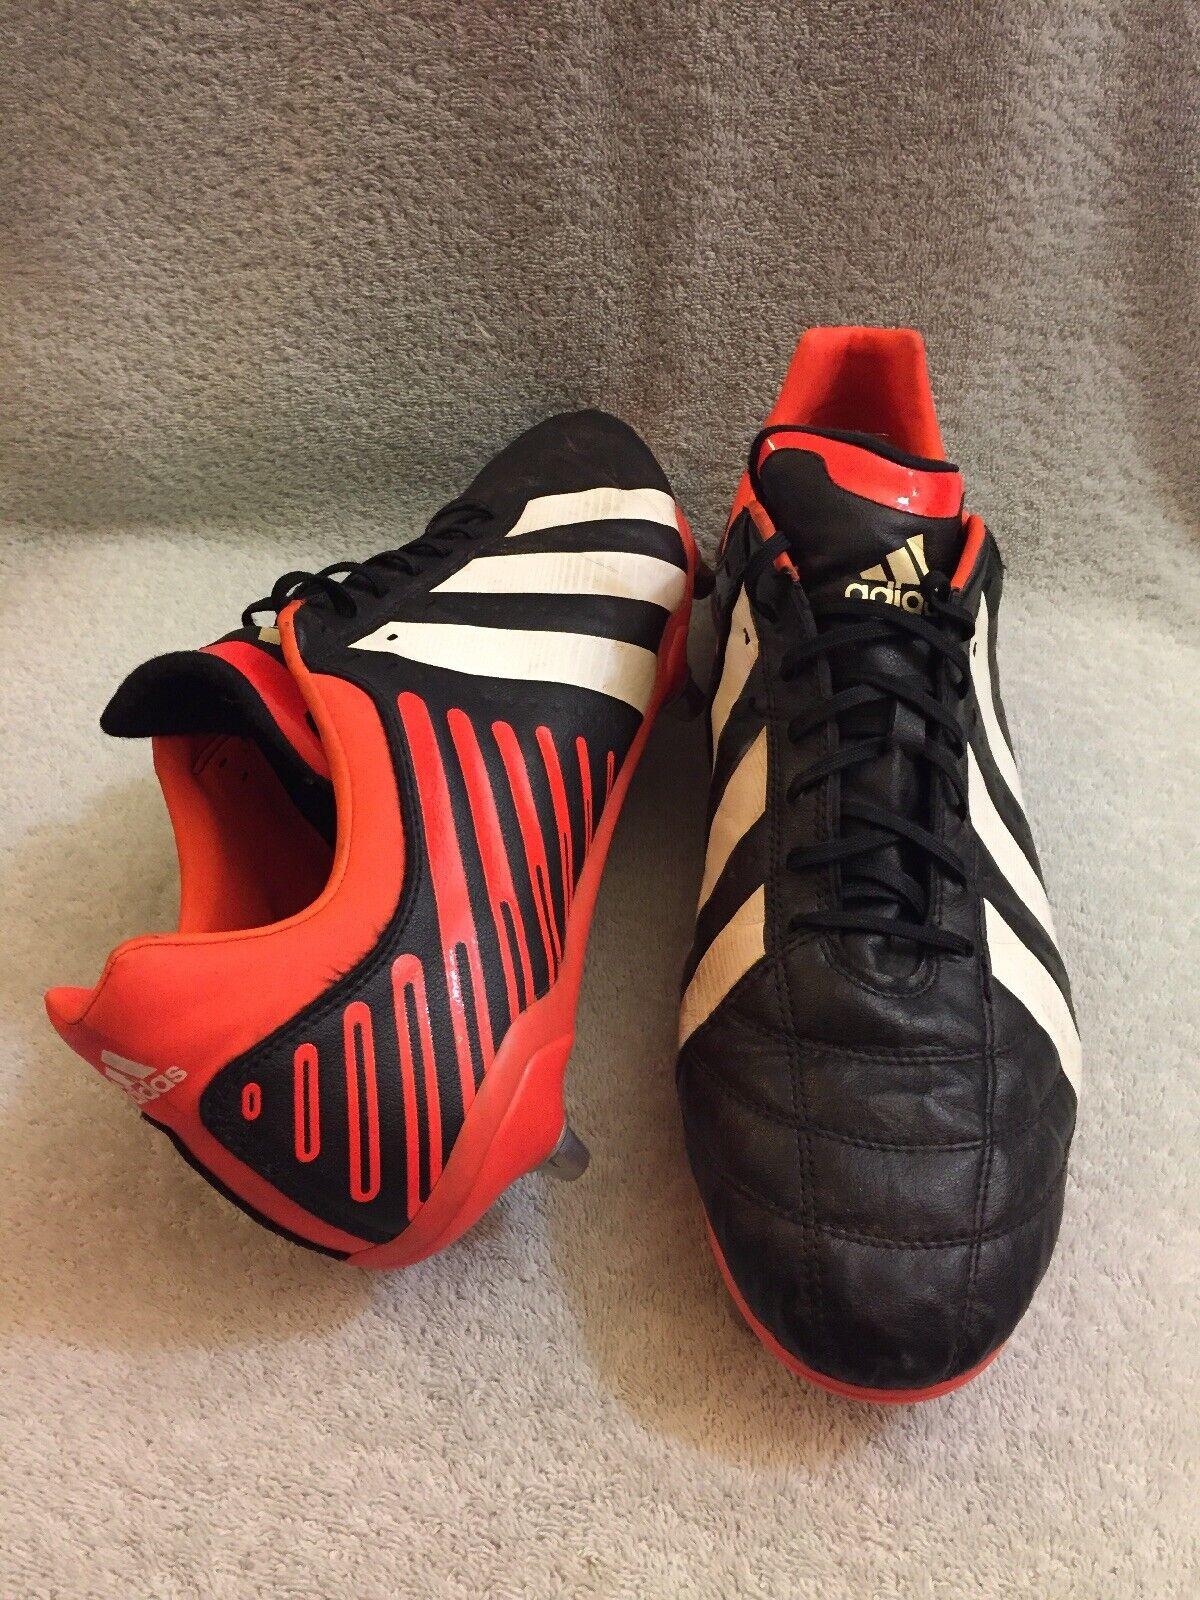 shoes Soccer SG Kakari Regulate MI Adidas orange G60027 16